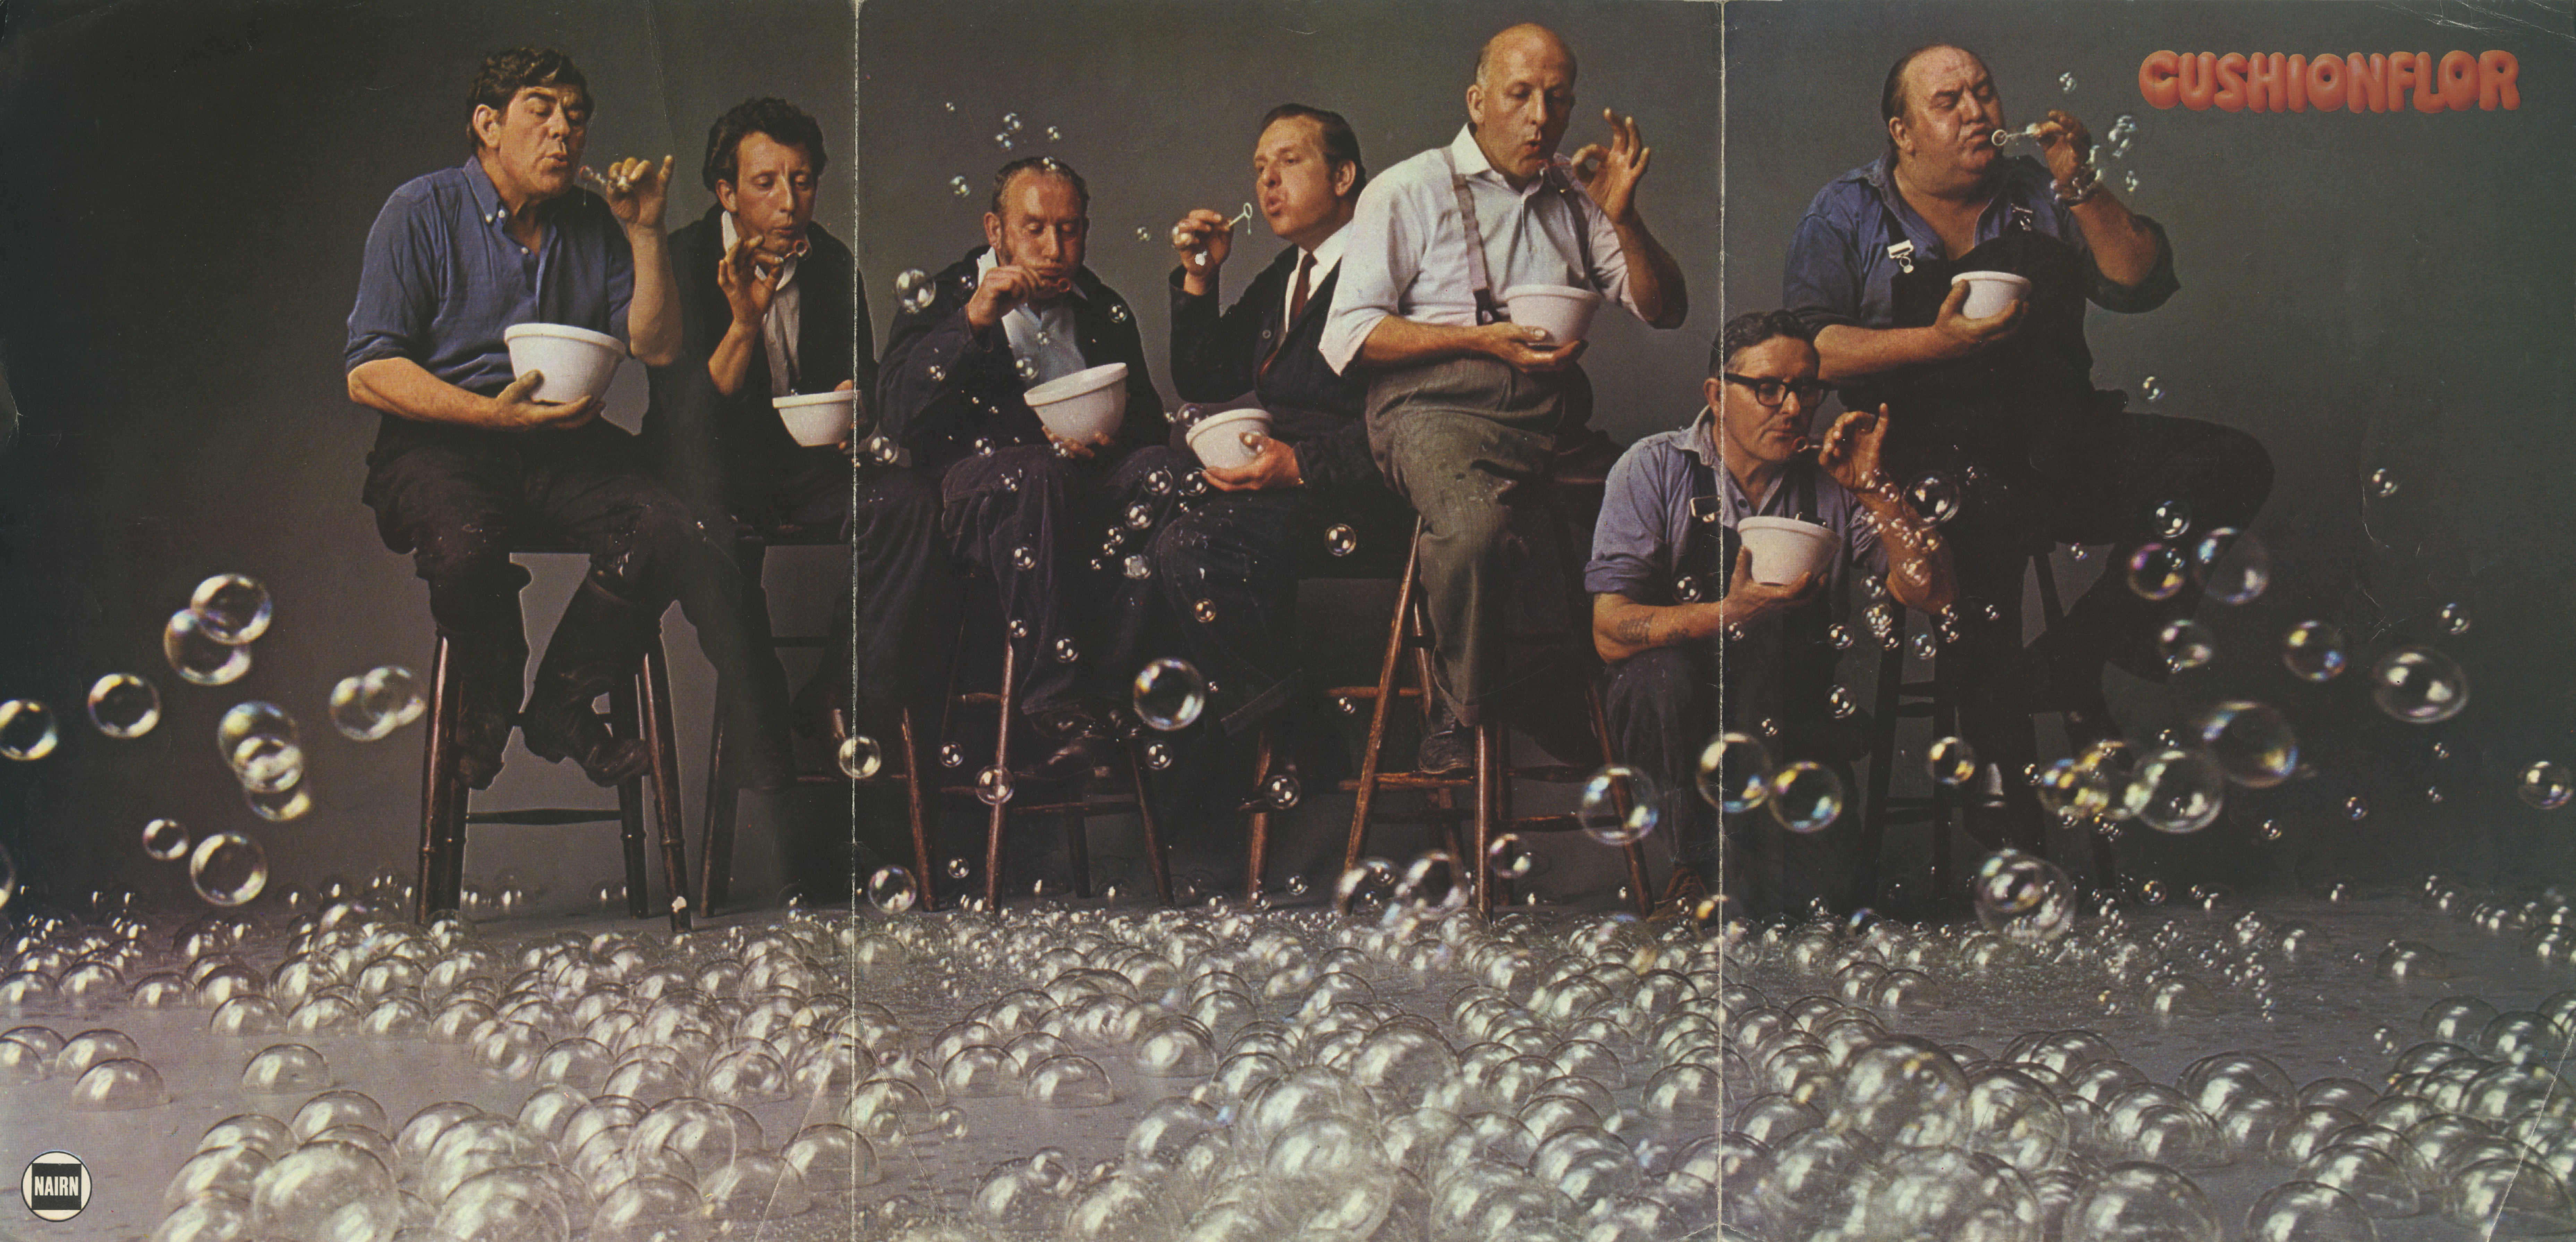 Cushionair 'Bubbles', David Holmes, KMP-01